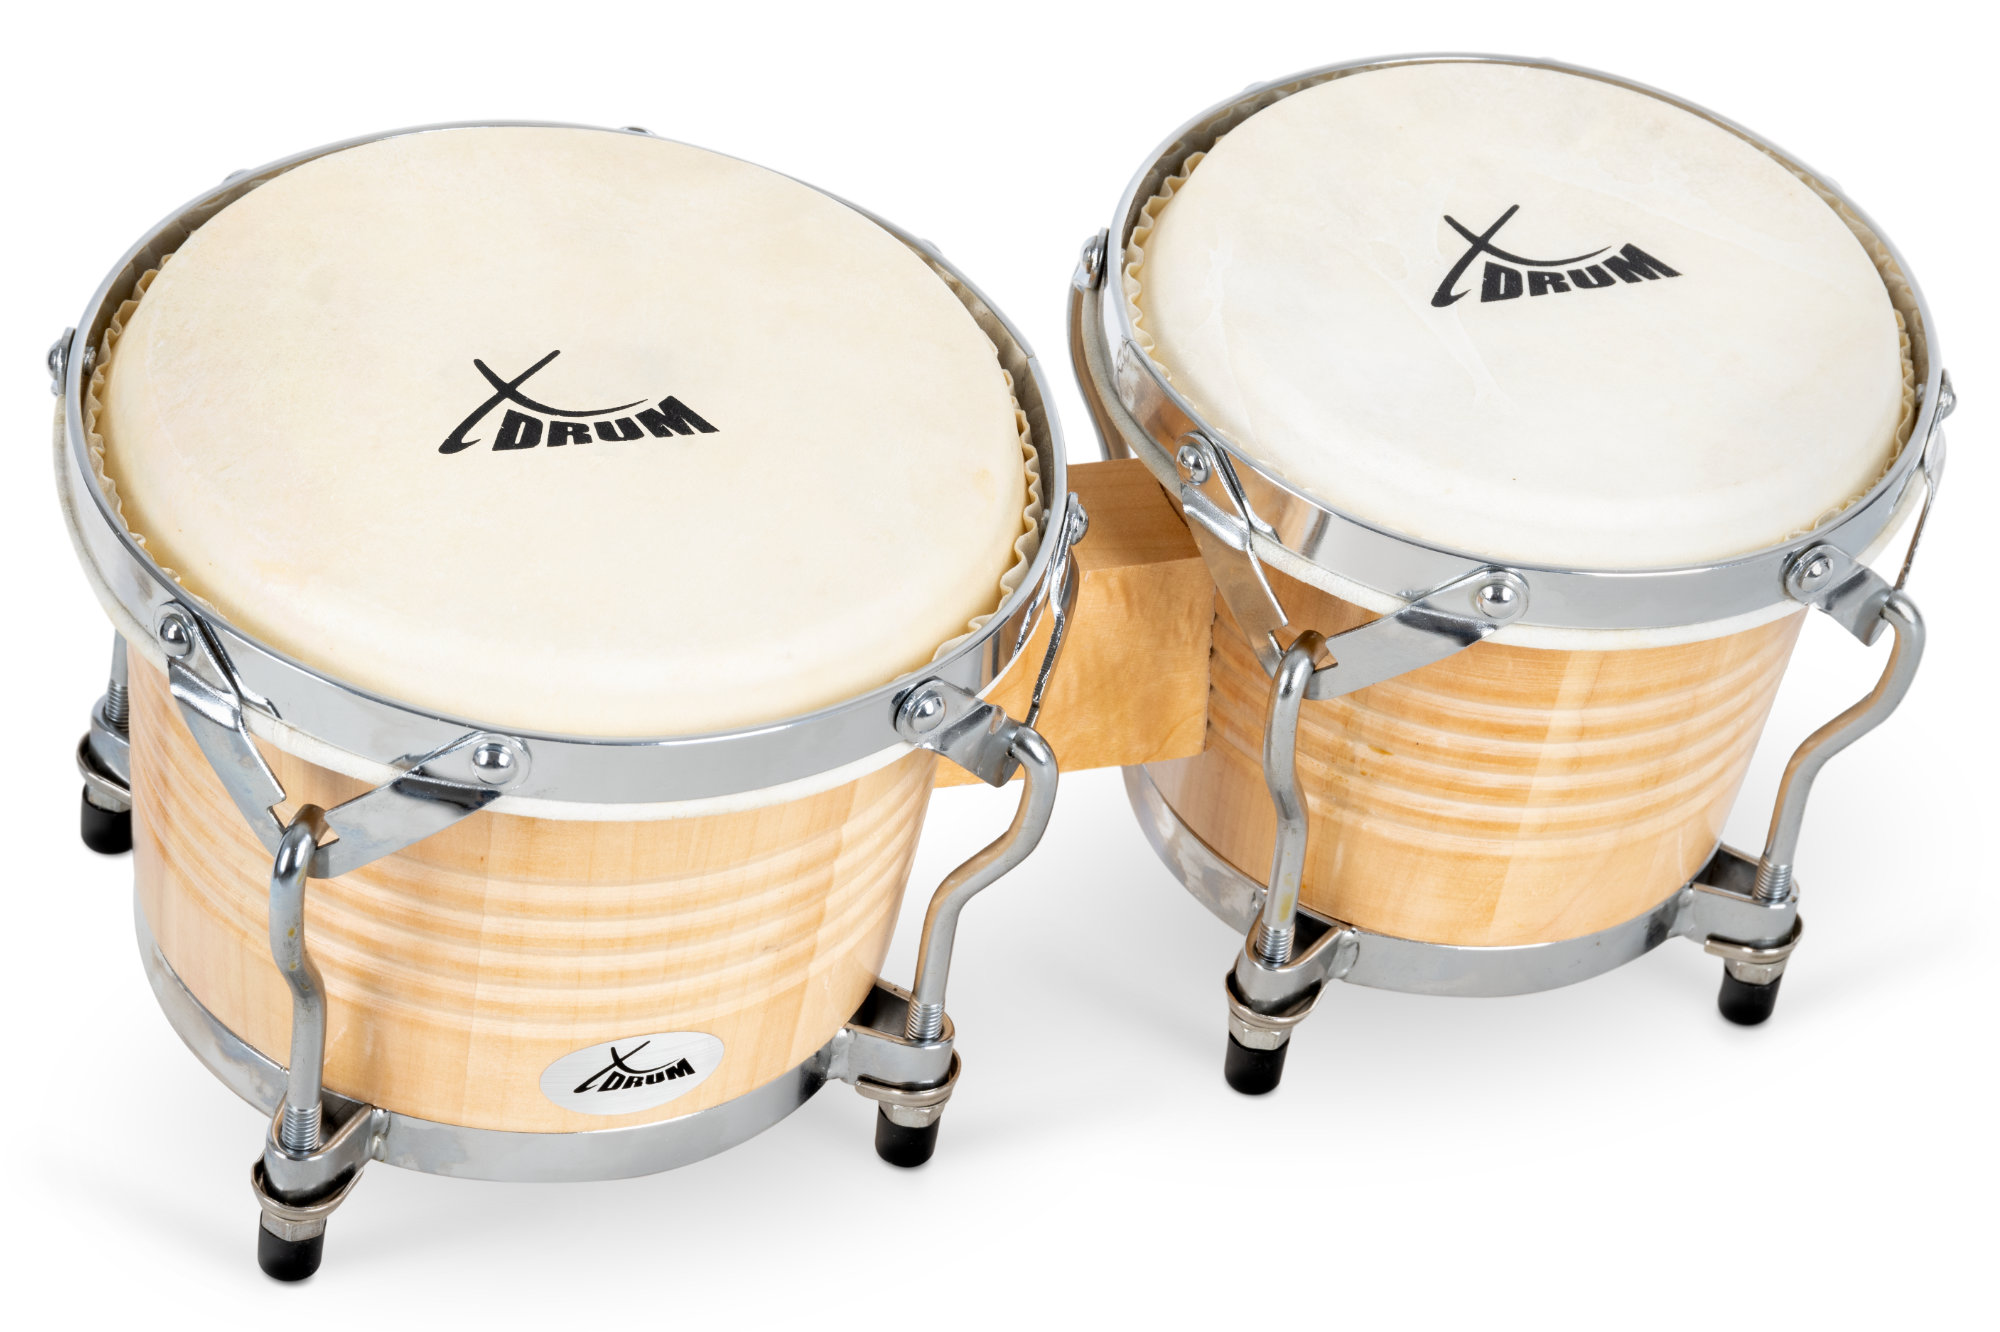 "XDrum 10/"" 11/"" Conga Set Latin Holz Trommeln Percussion Stativ Set Natur"